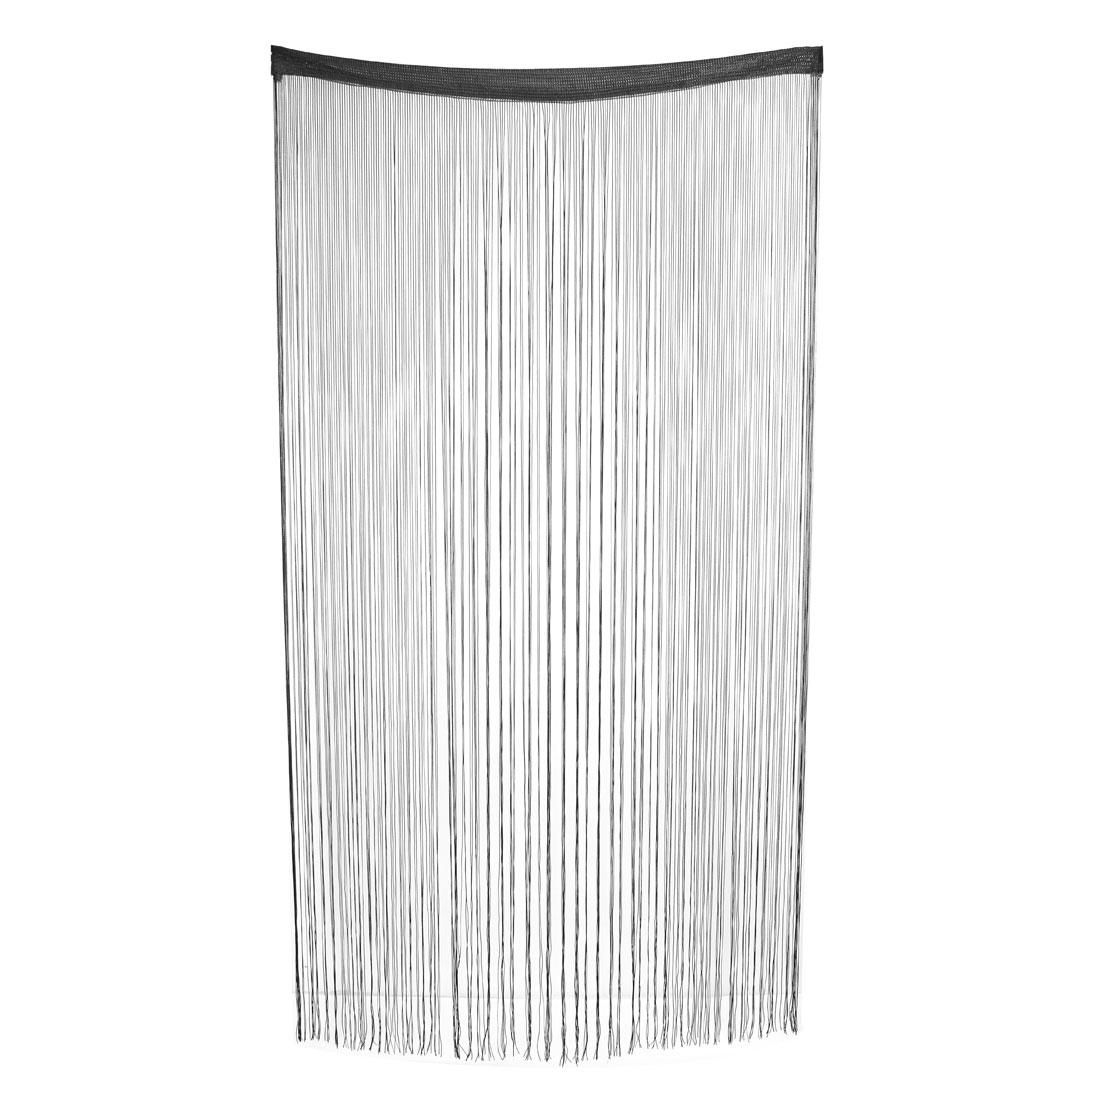 Window Straight Line Tassel Divider Decoration String Curtain Black